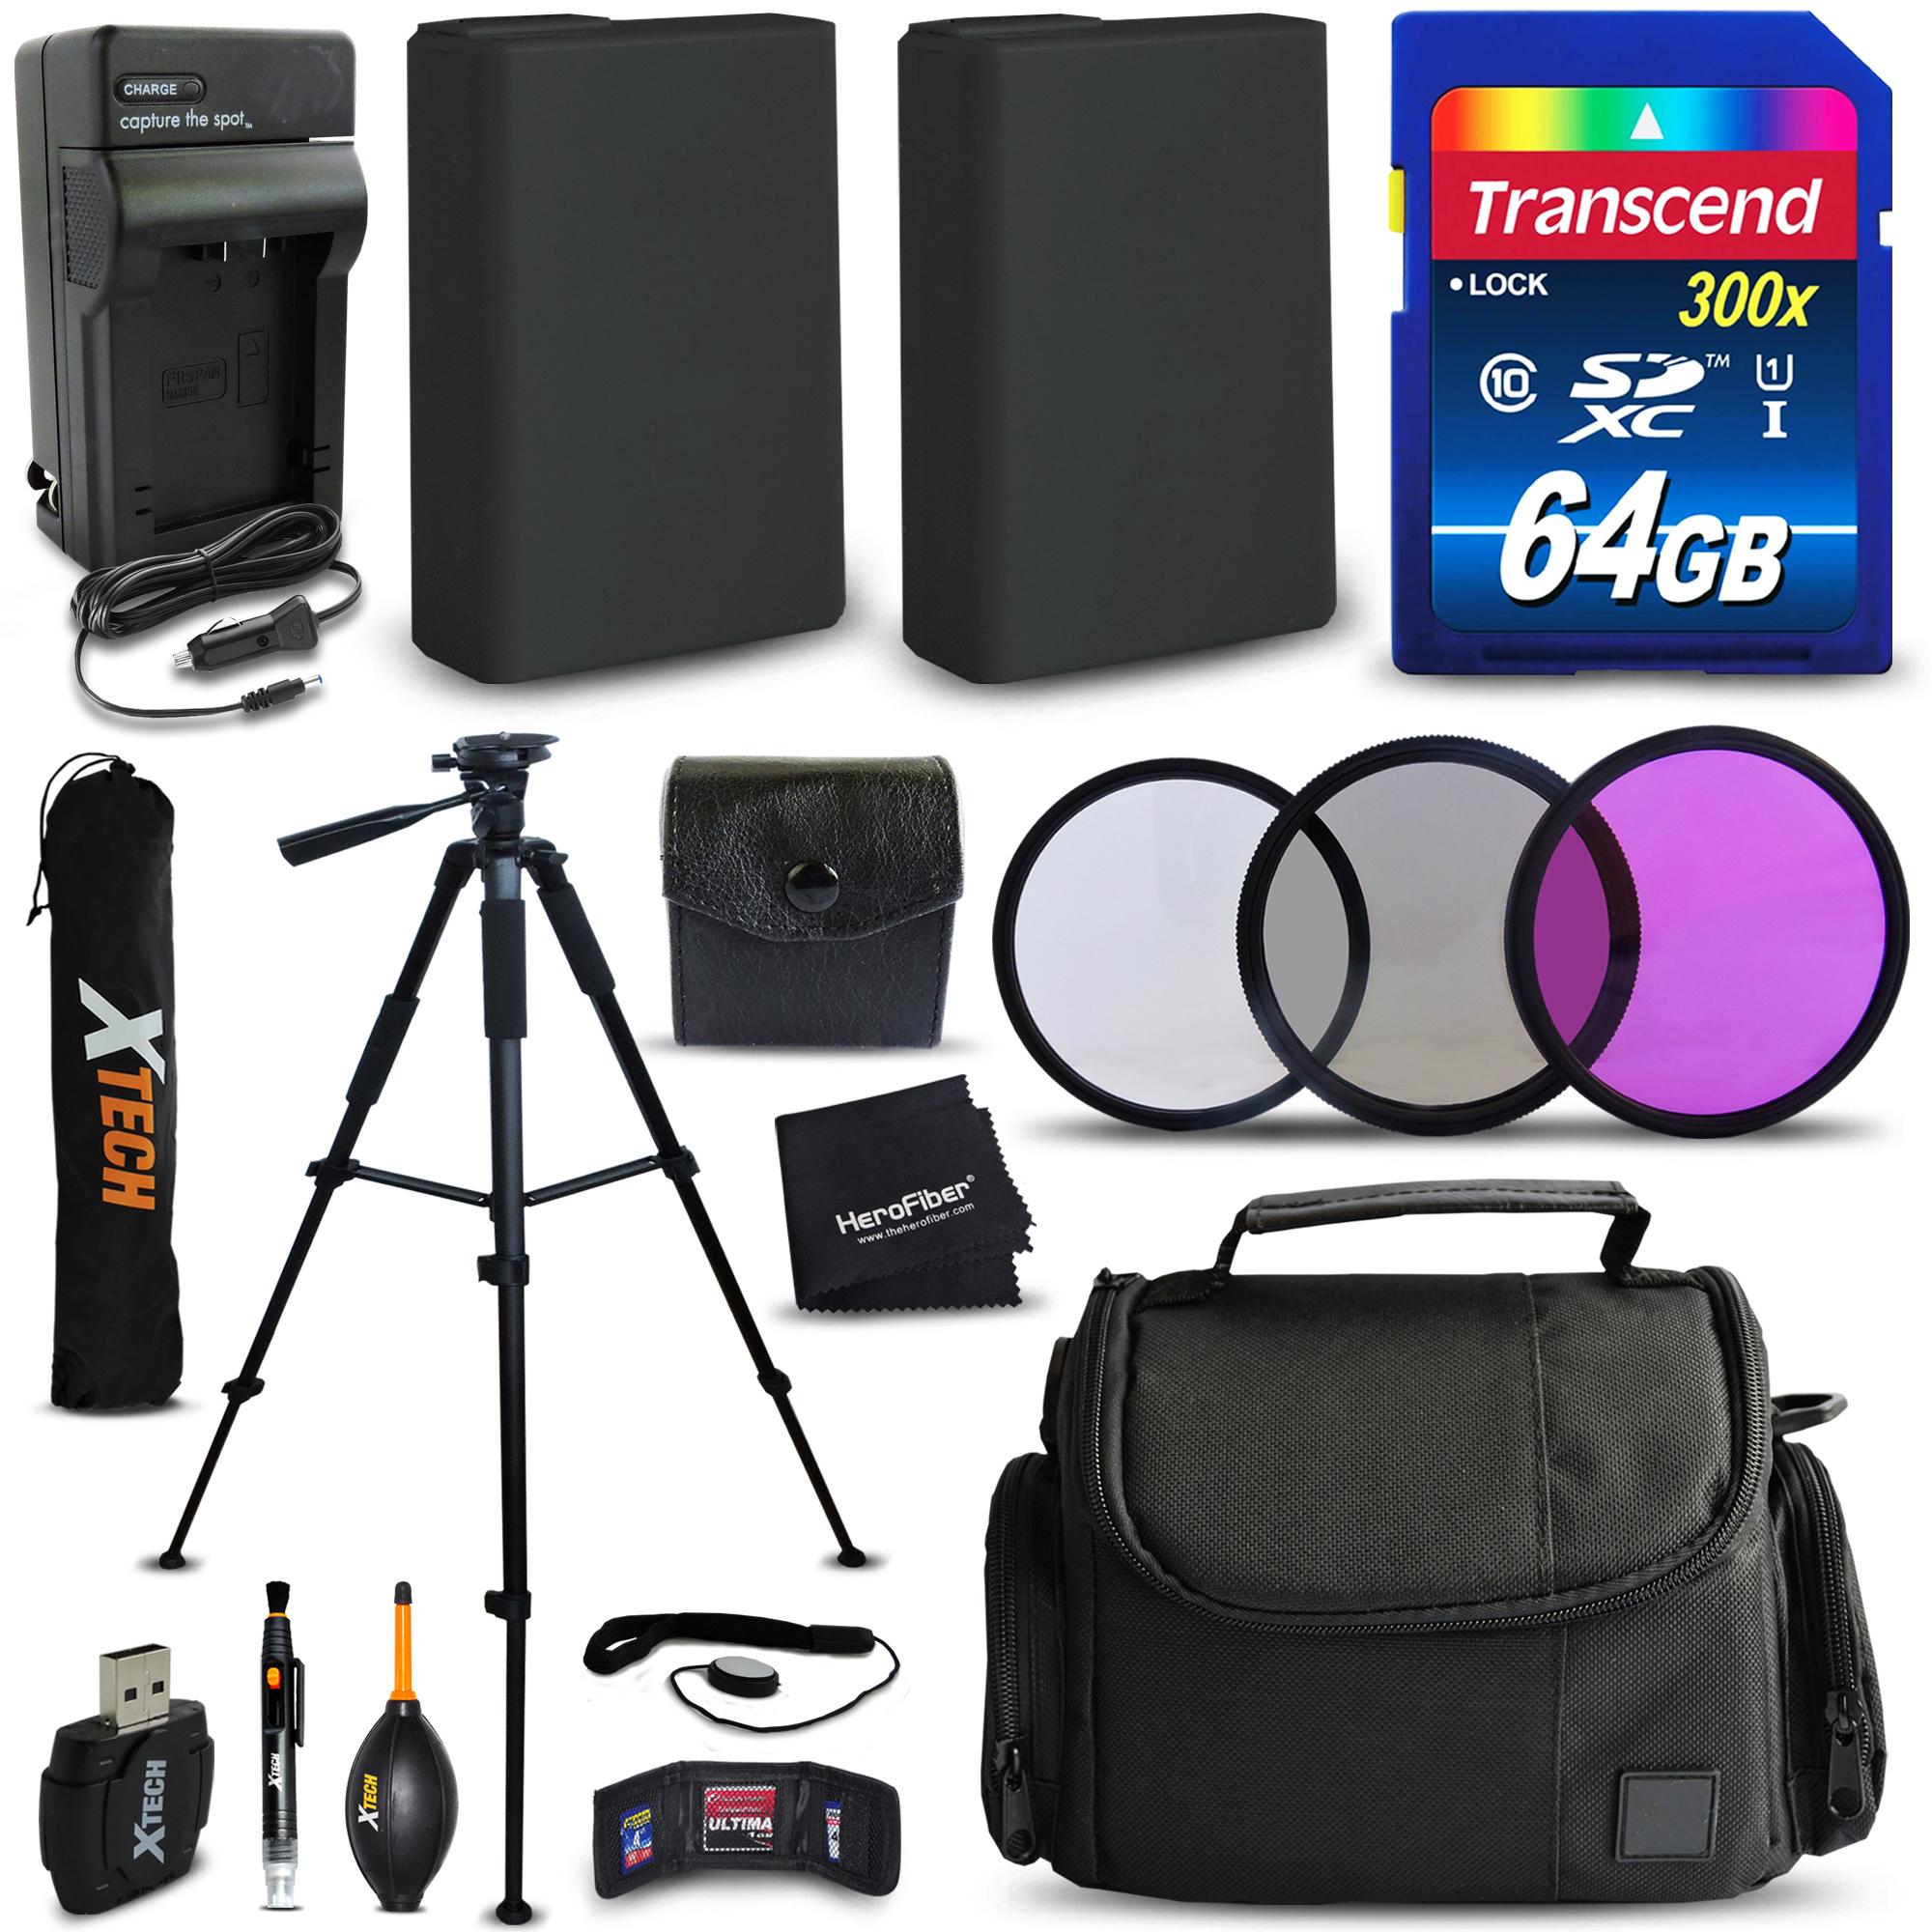 64GB Memory + 2 LP-E10 Batteries + Accessories Kit for Ca...